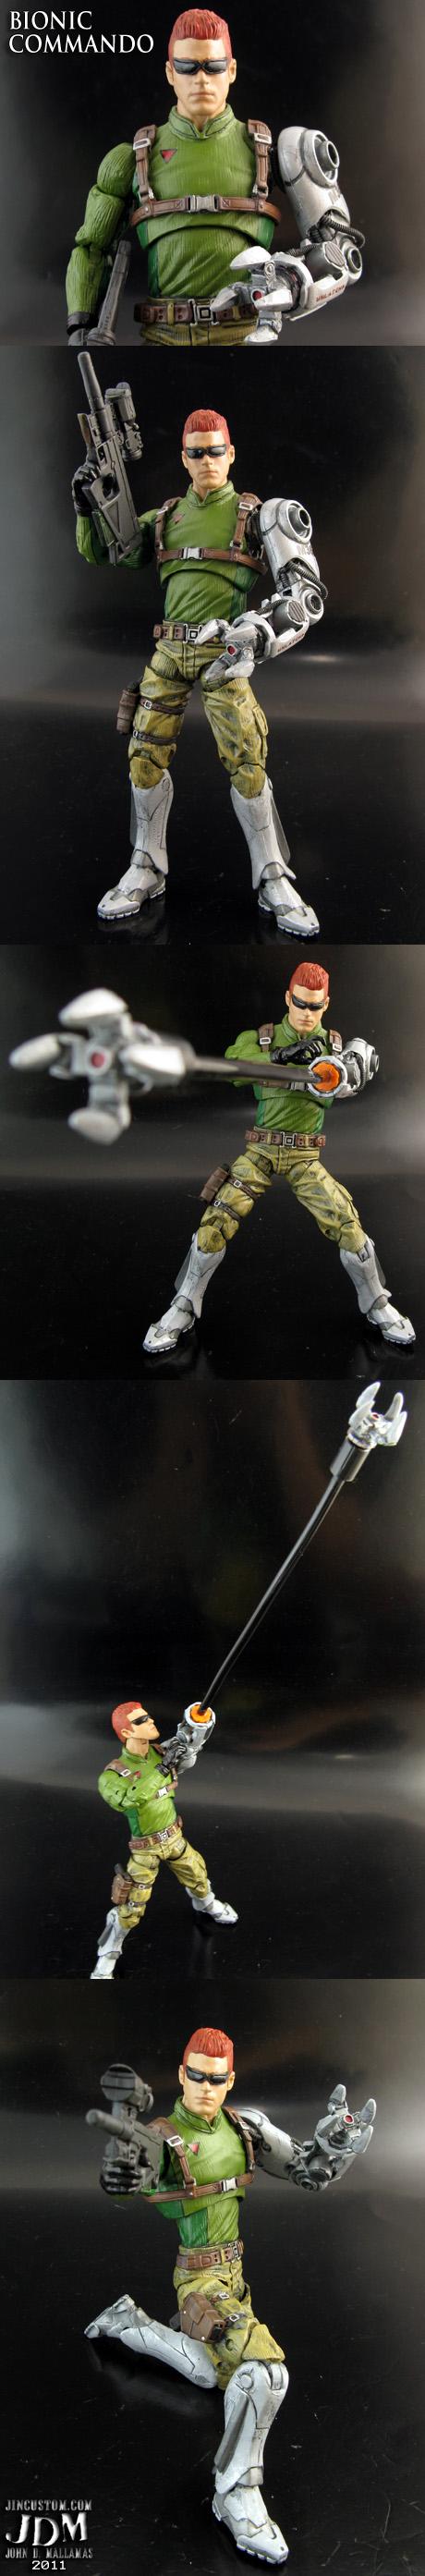 Bionic Commando Figure